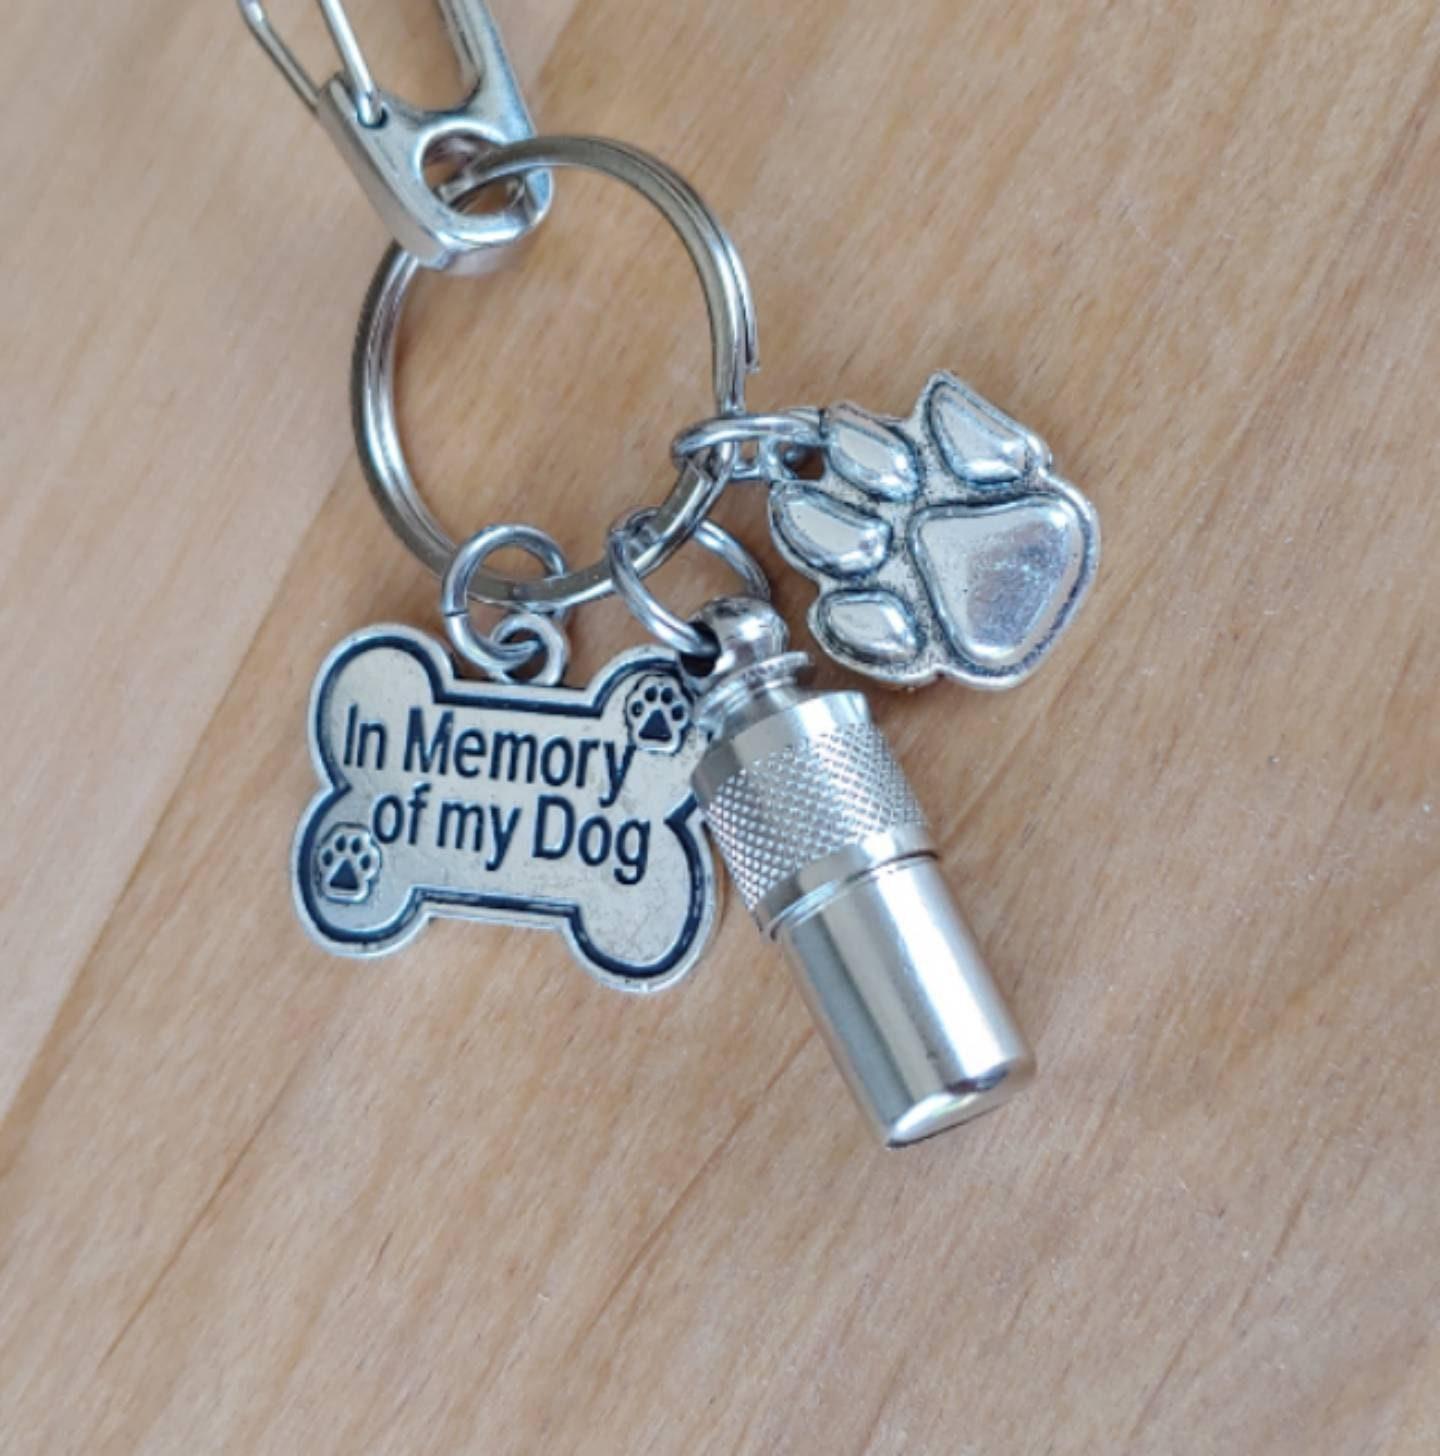 In Memory of My Dog Keepsake Urn KeyChain Pet Hair Locket Memory Keeper Dog Urn Cremation Jewelry Pet Memorial Pet Urn Jewelry